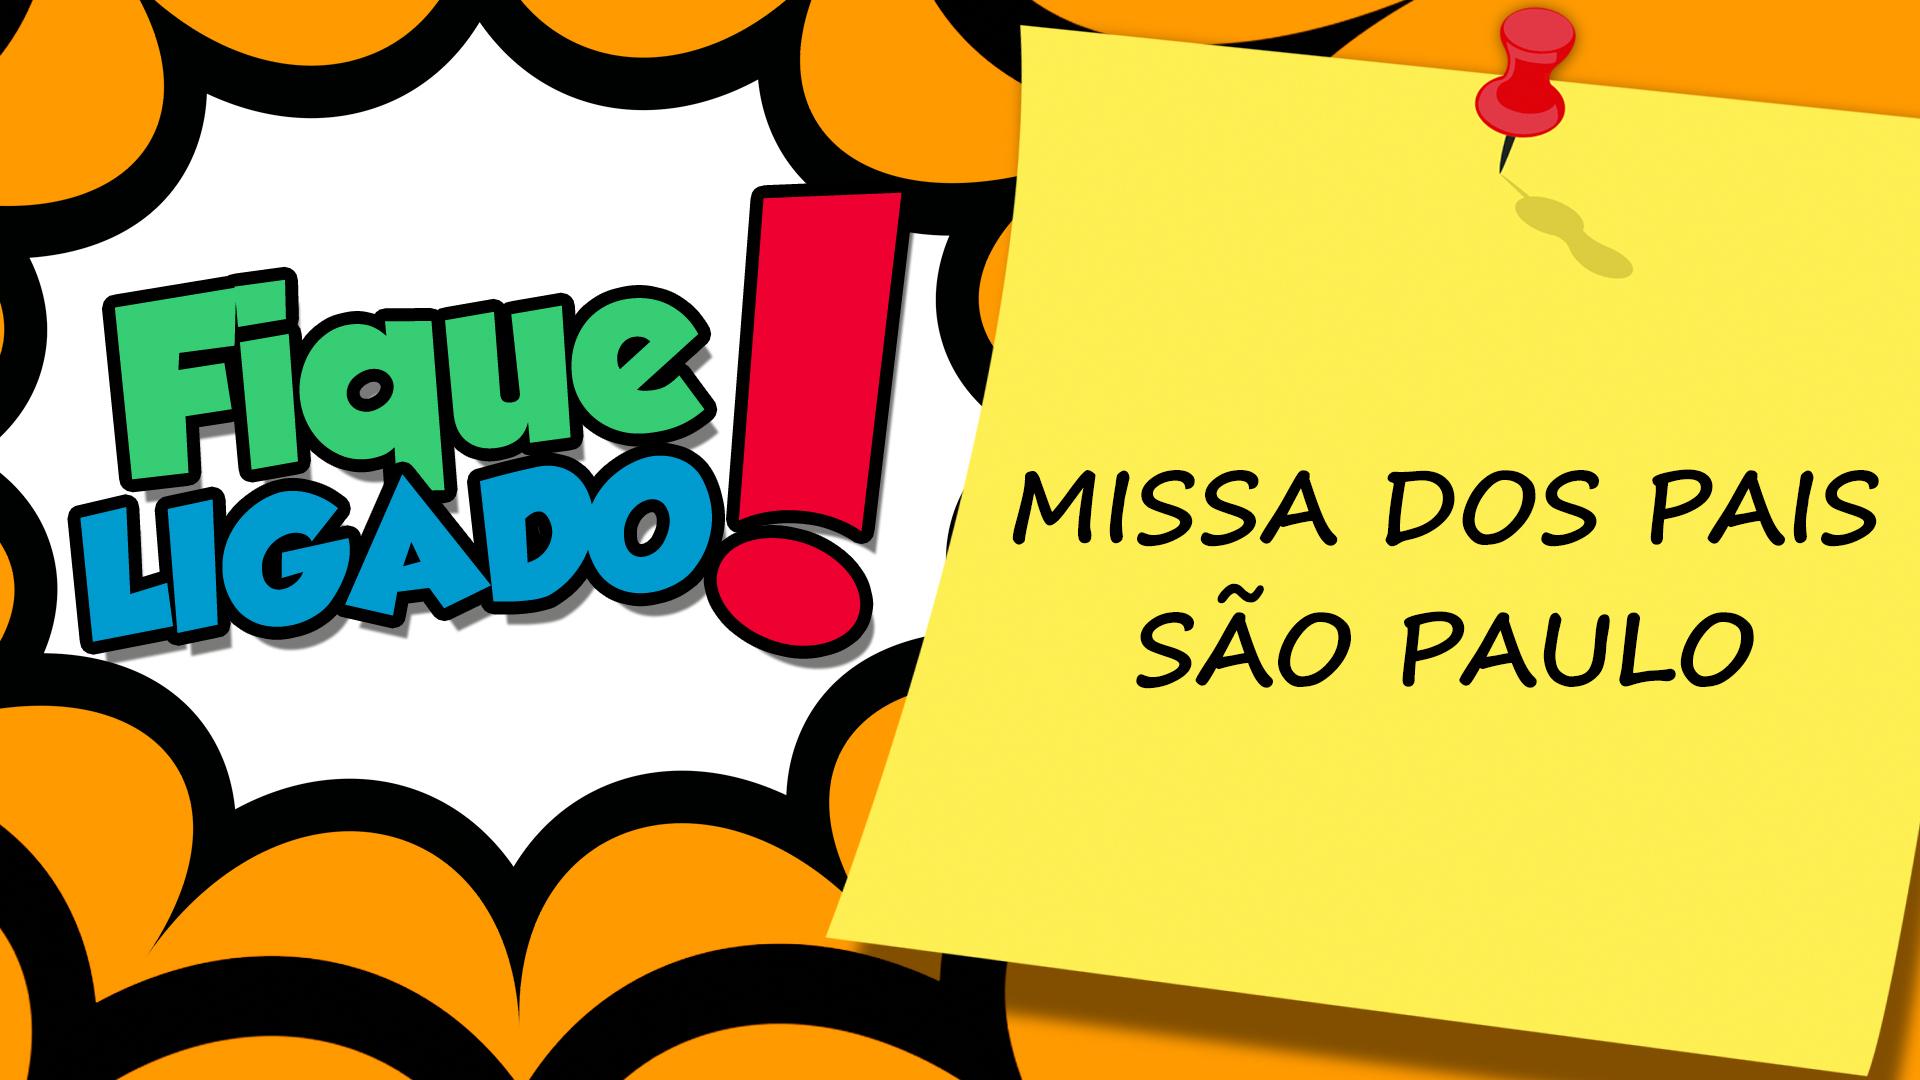 [Missa dos Pais - São Paulo]